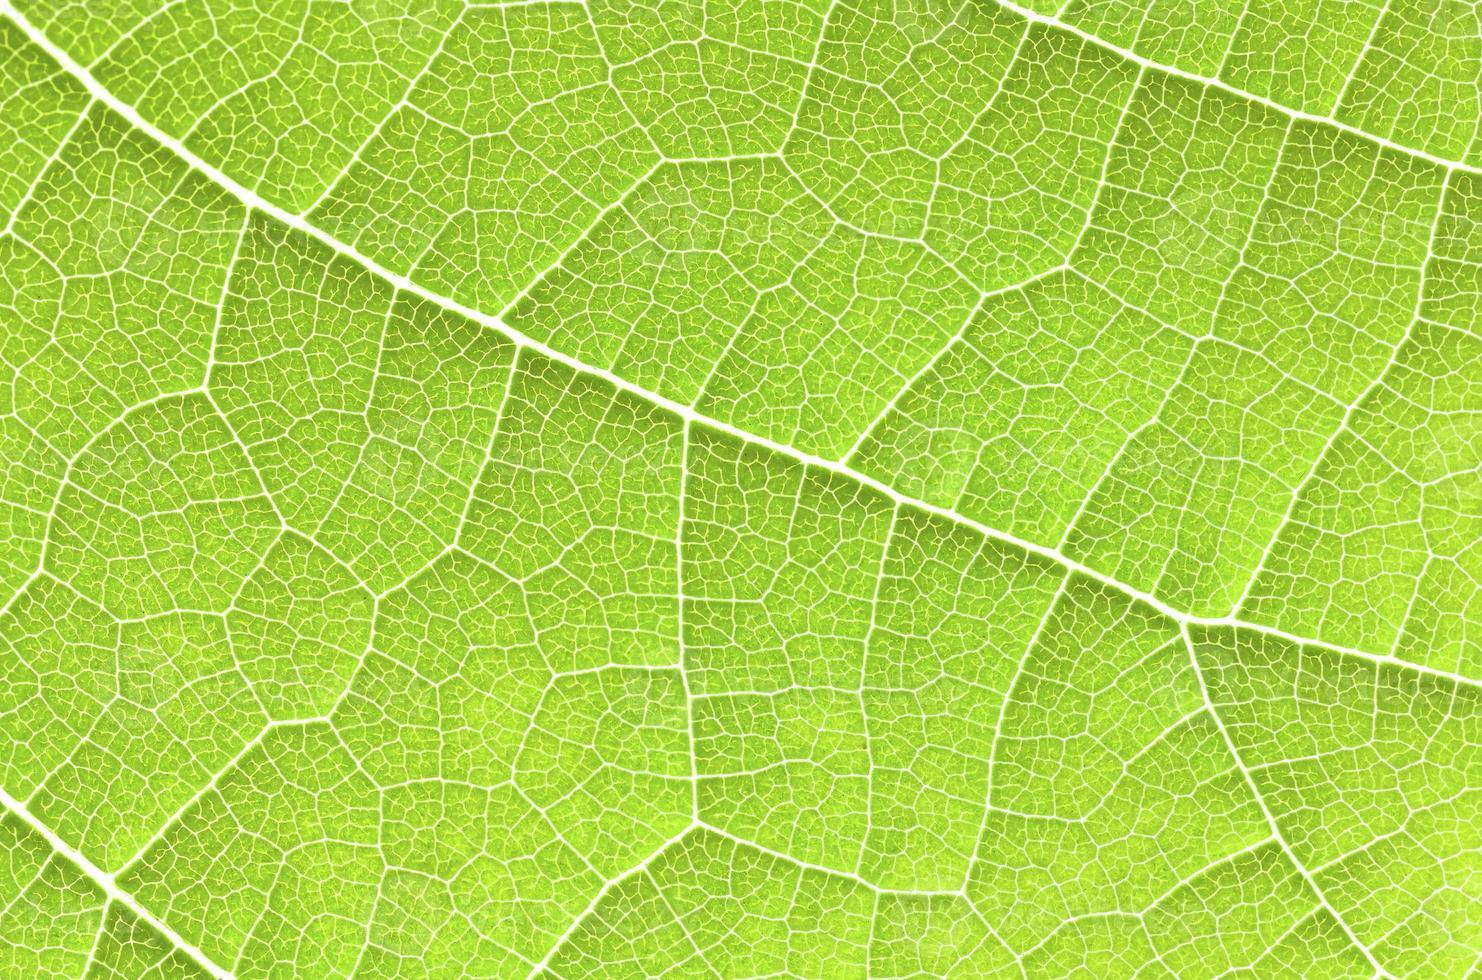 grünes Blatt nah oben. foto